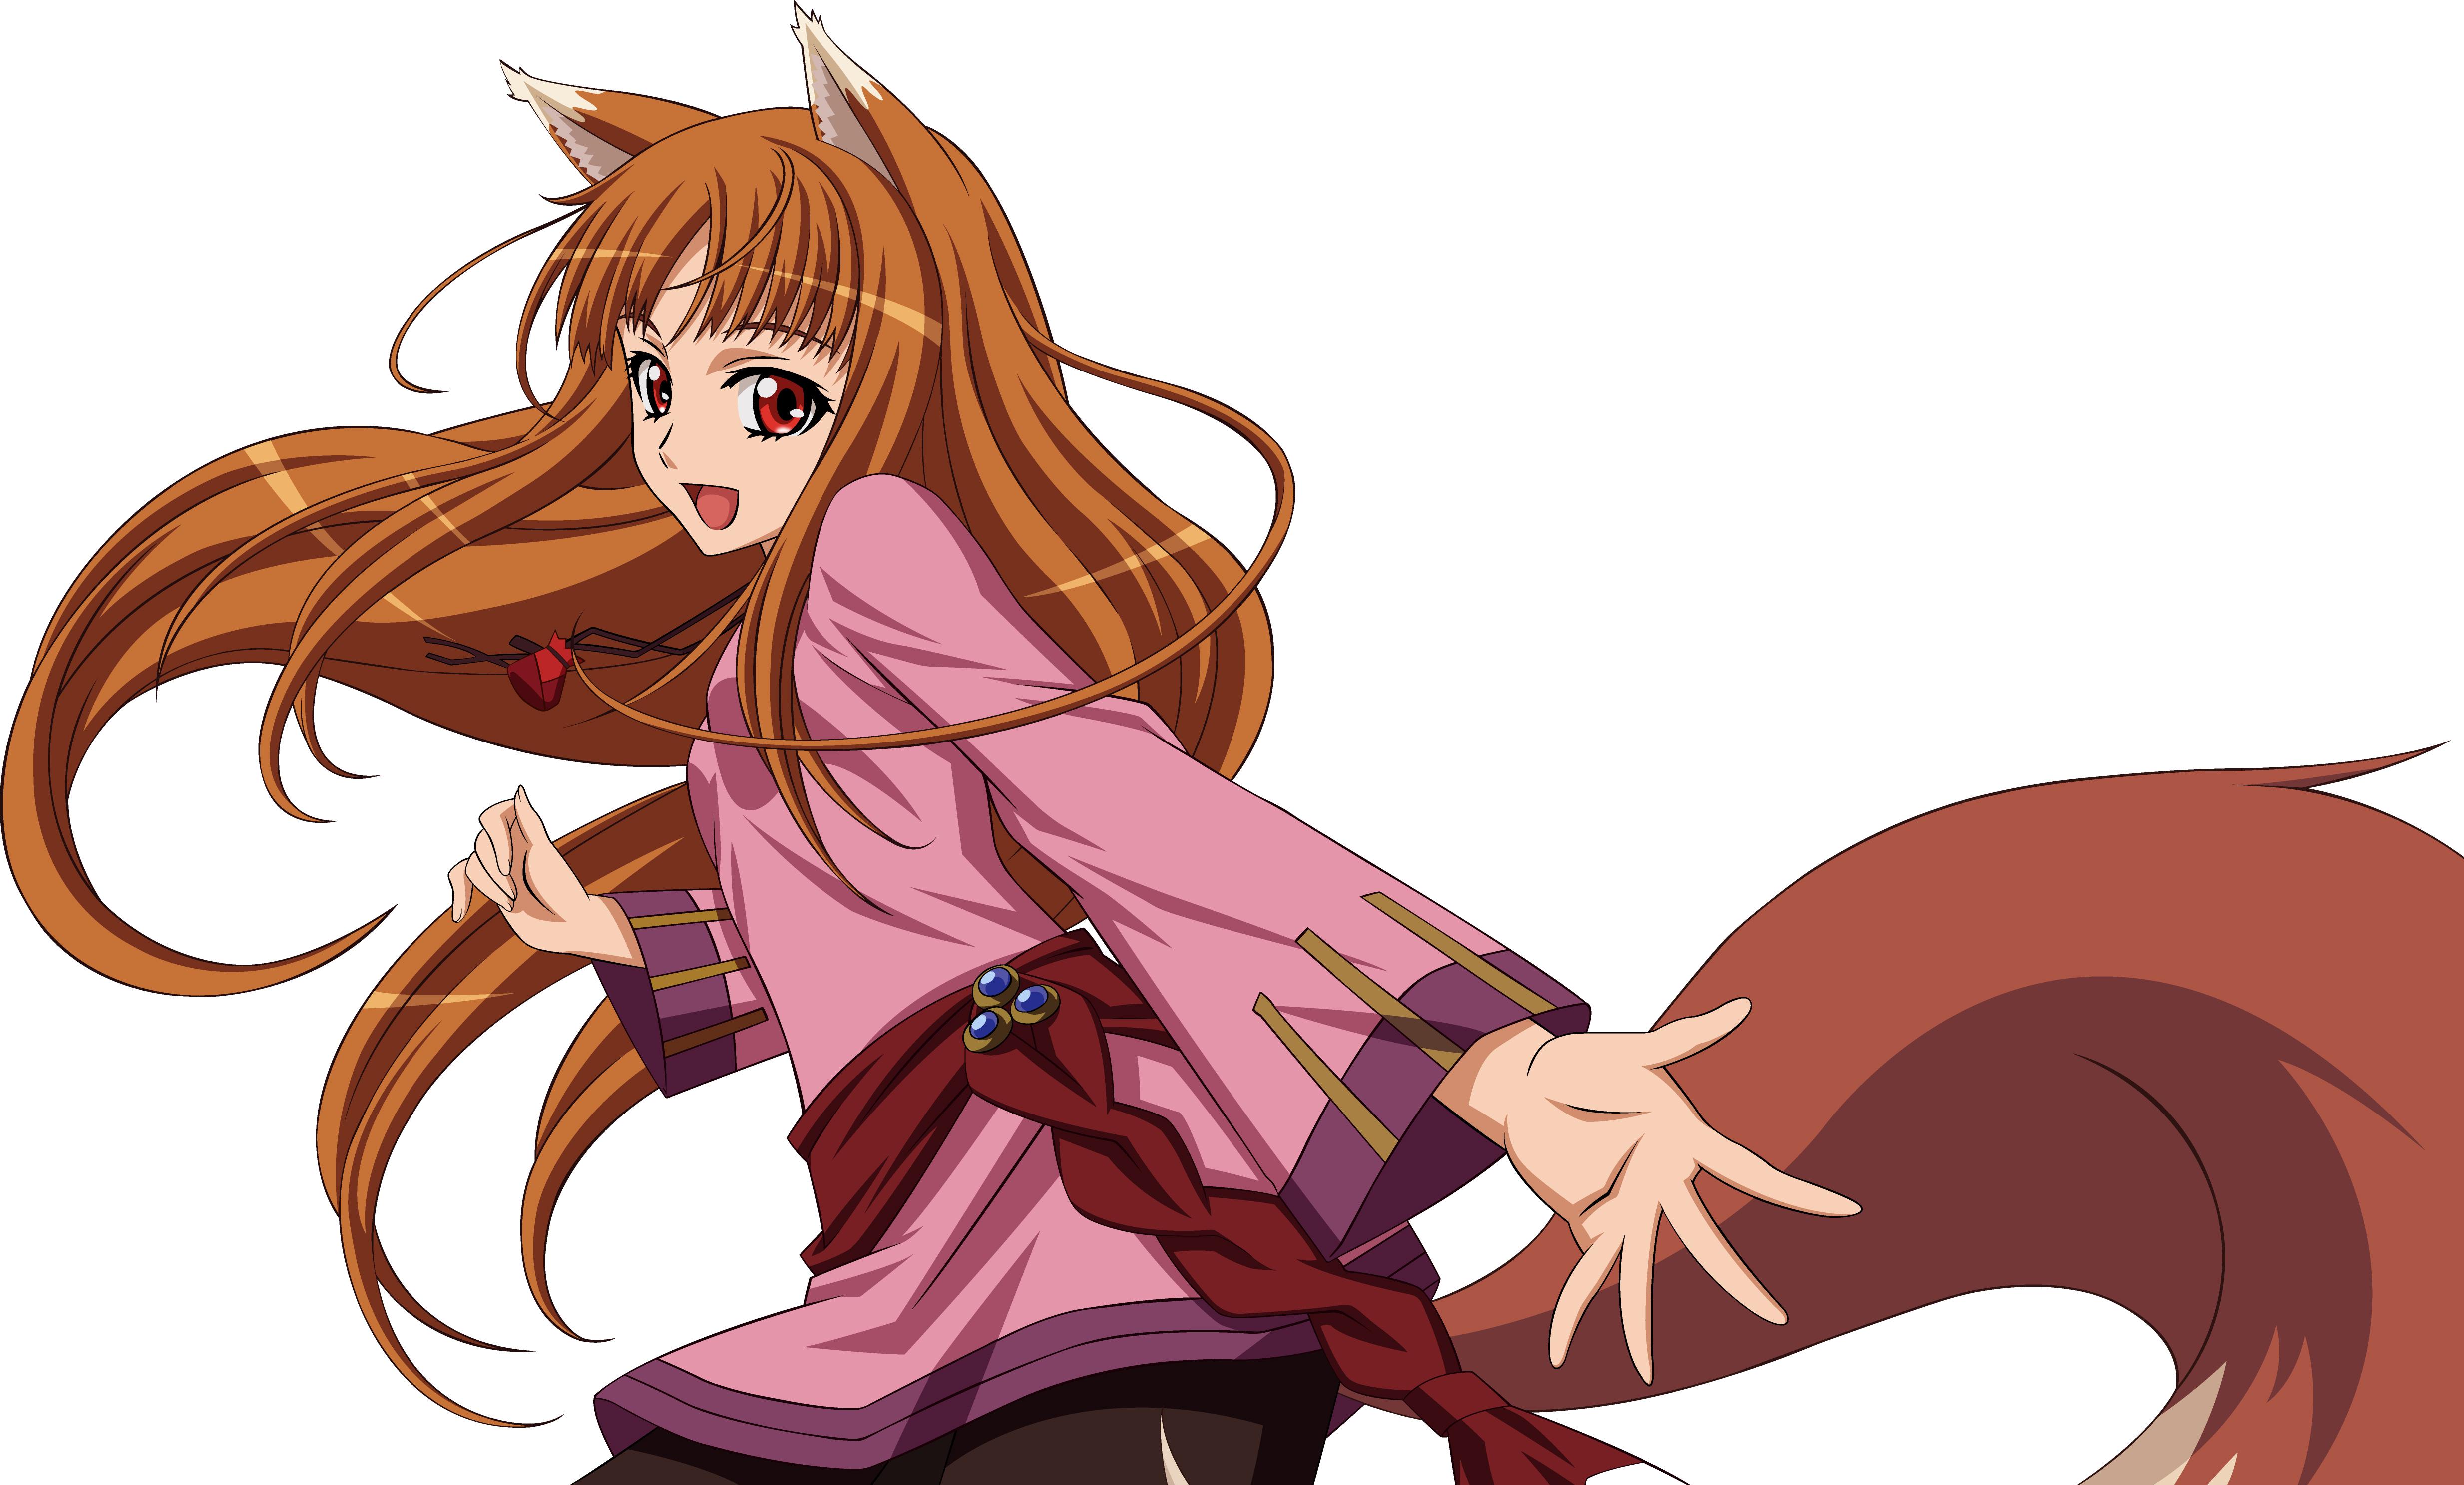 Wallpaper : illustration, anime, cartoon, fox, Spice and Wolf, girl.